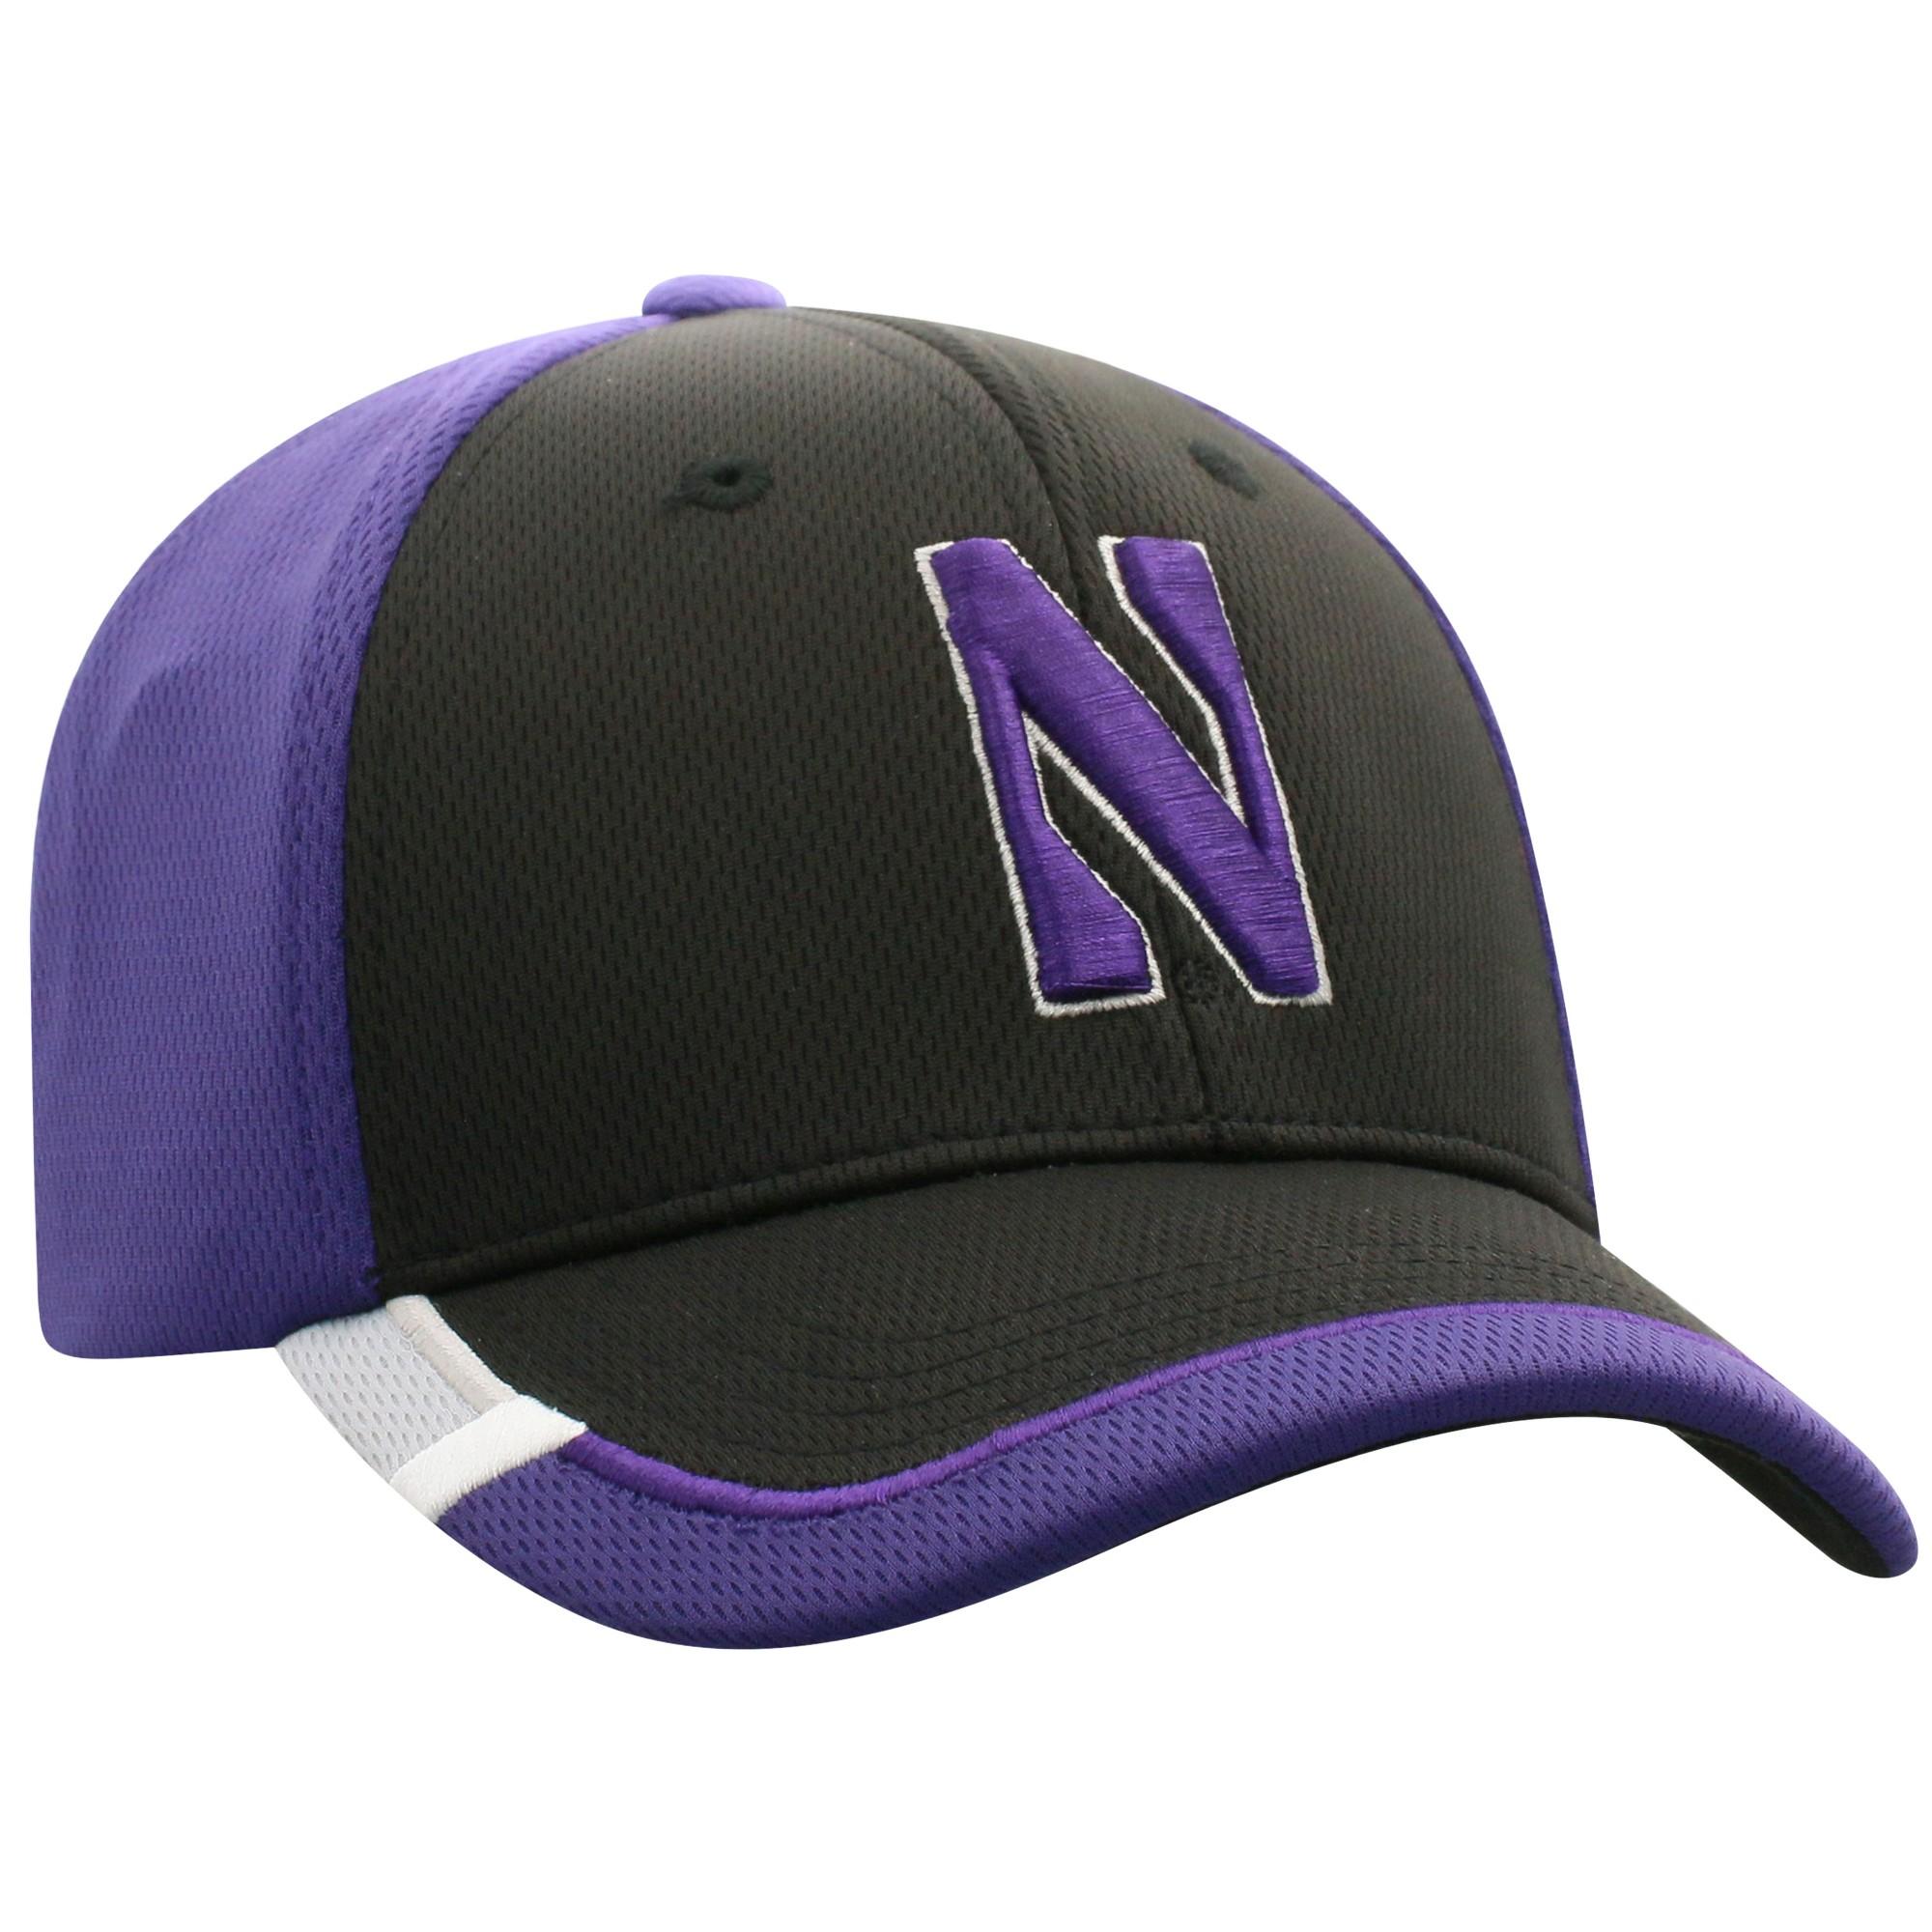 84d4e26c3bc NCAA Boys  Northwestern Wildcats Topper Hat